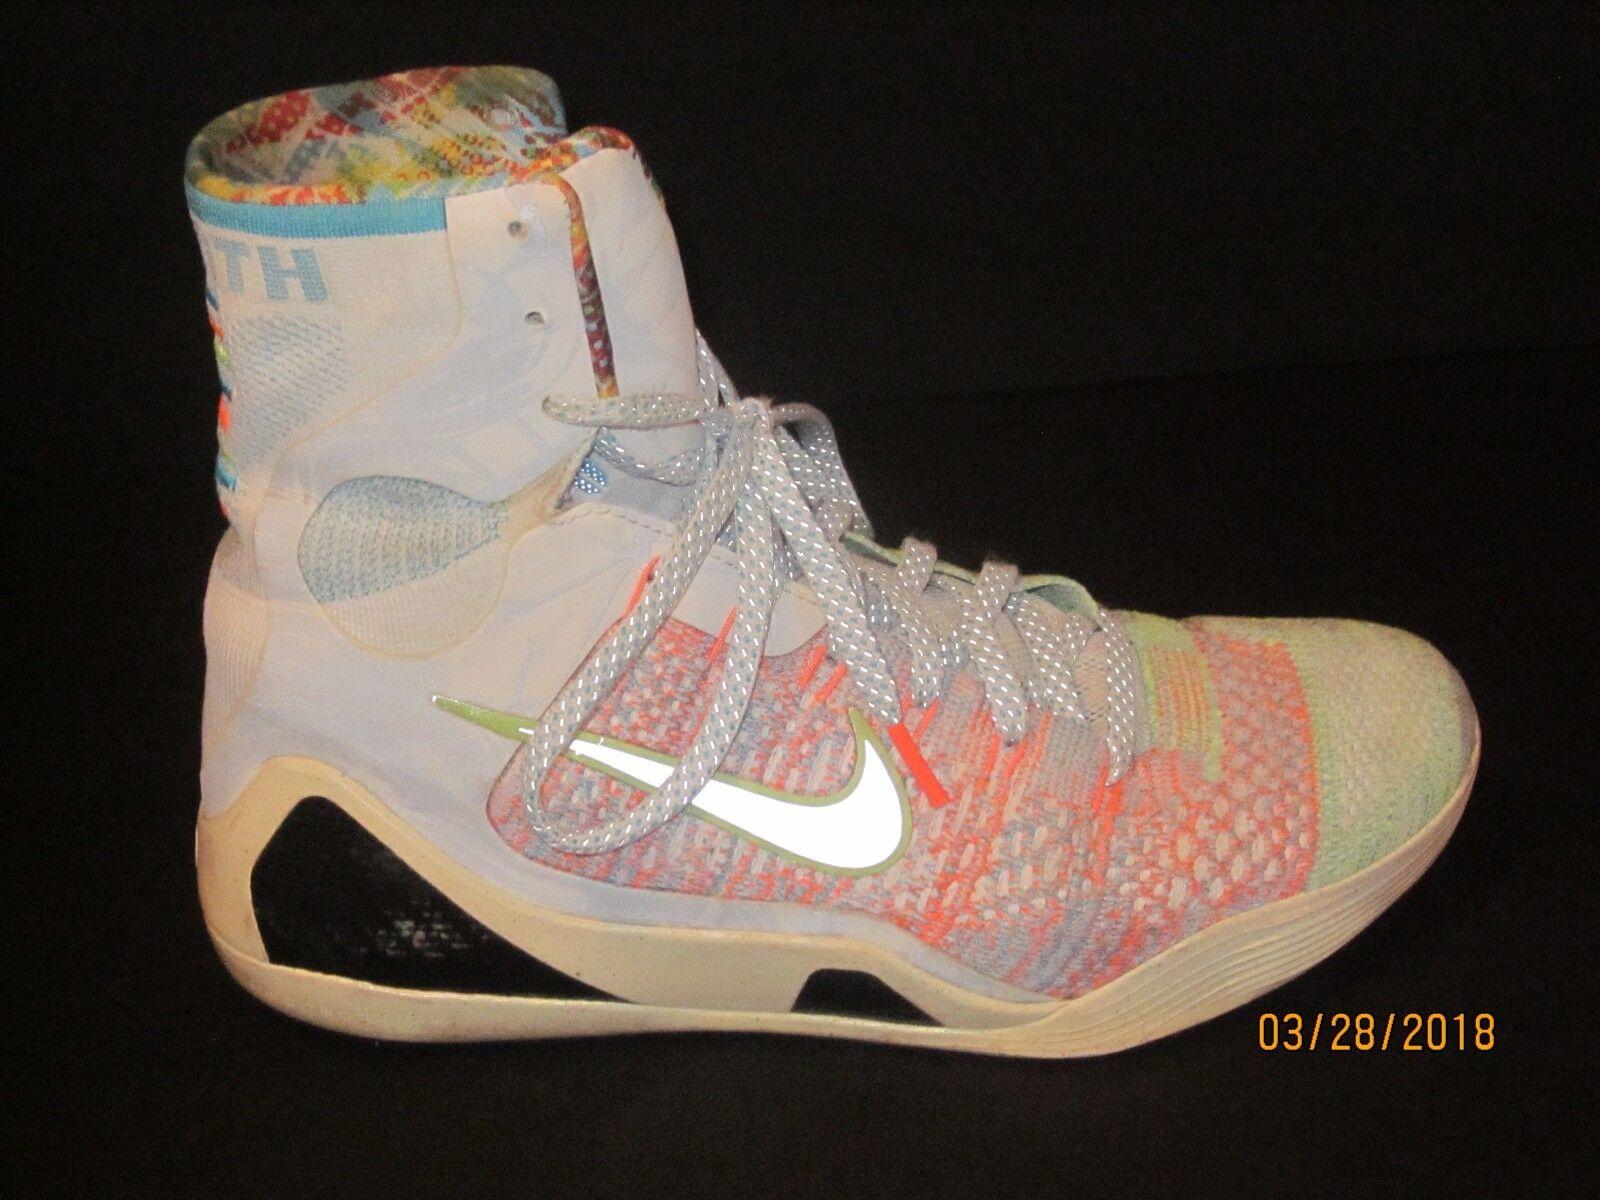 Nike Kobe Bryant KB IX Ninth Elite Premium Shoes Neon Men 9.5 1/2 678301-904 204